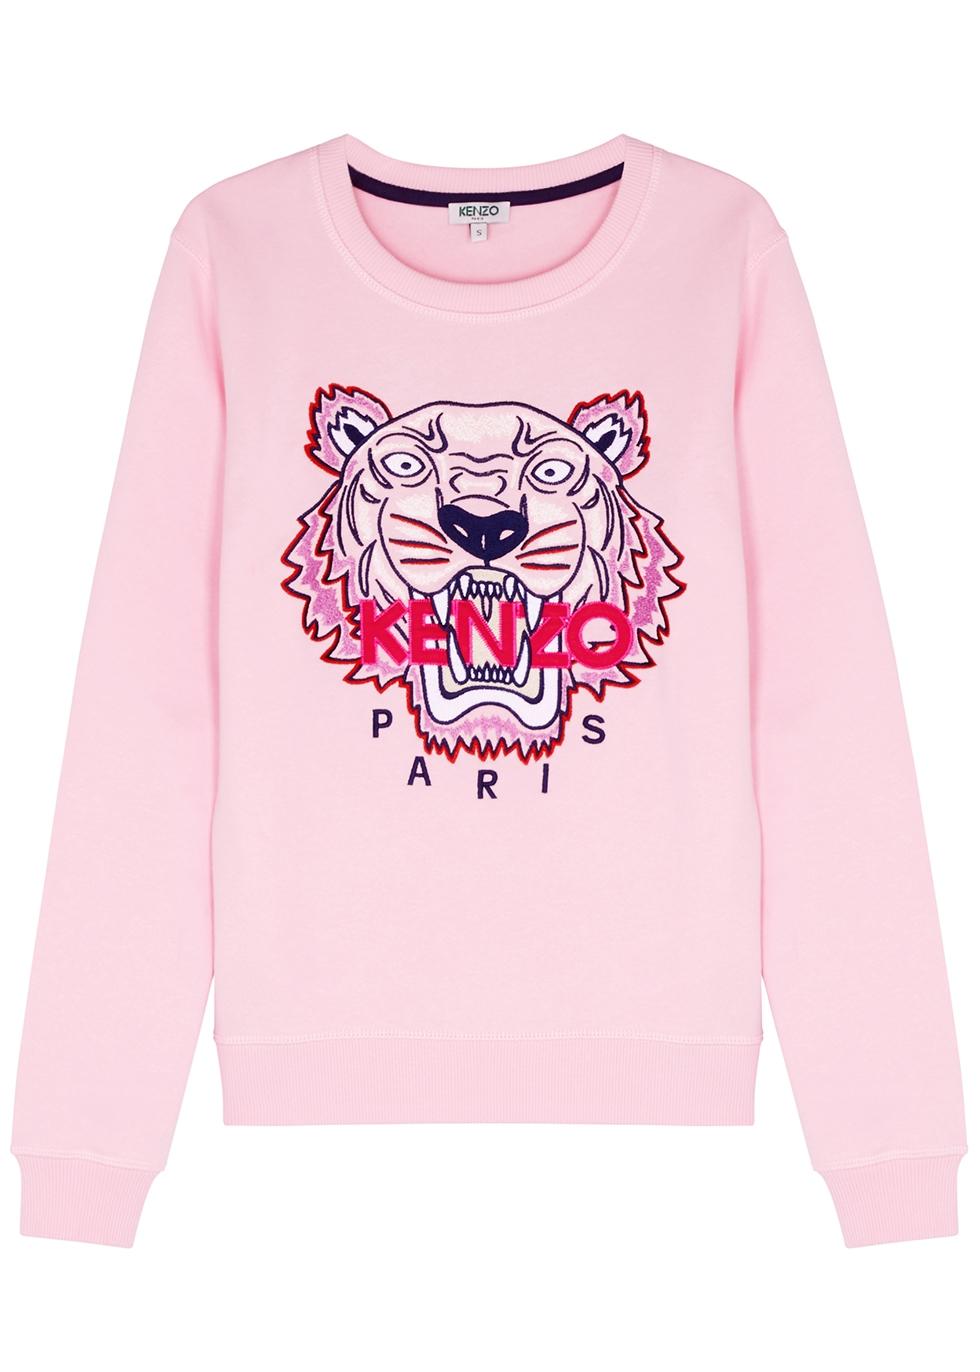 8a3e4d98 Kenzo - Designer Sweatshirts, T-Shirts, Bags - Harvey Nichols